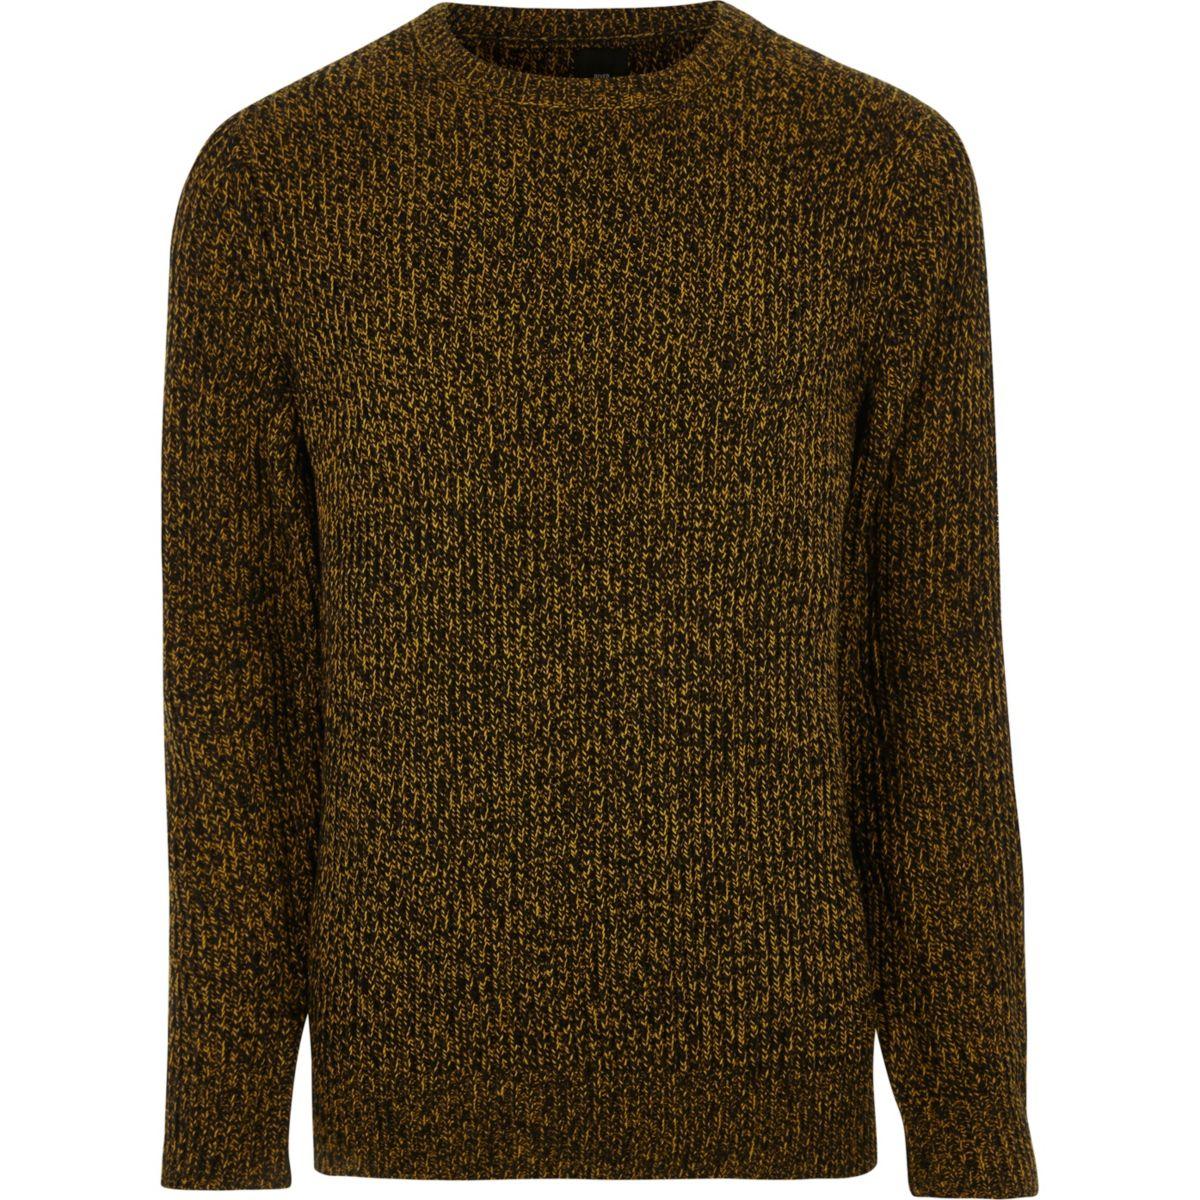 Mustard yellow crew neck knit jumper